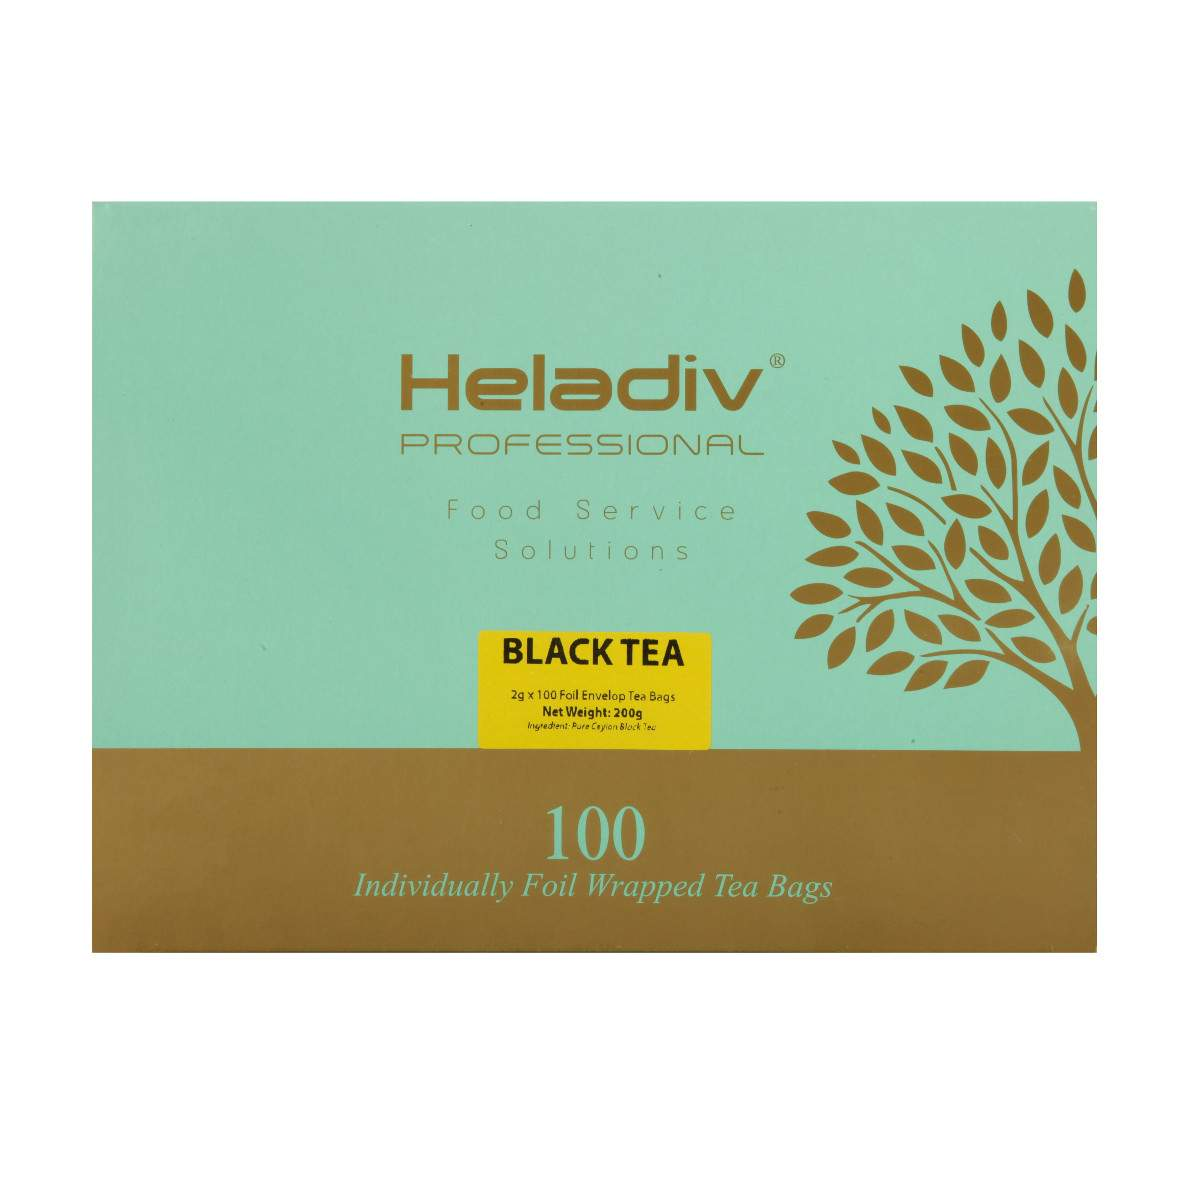 Heladiv Professional